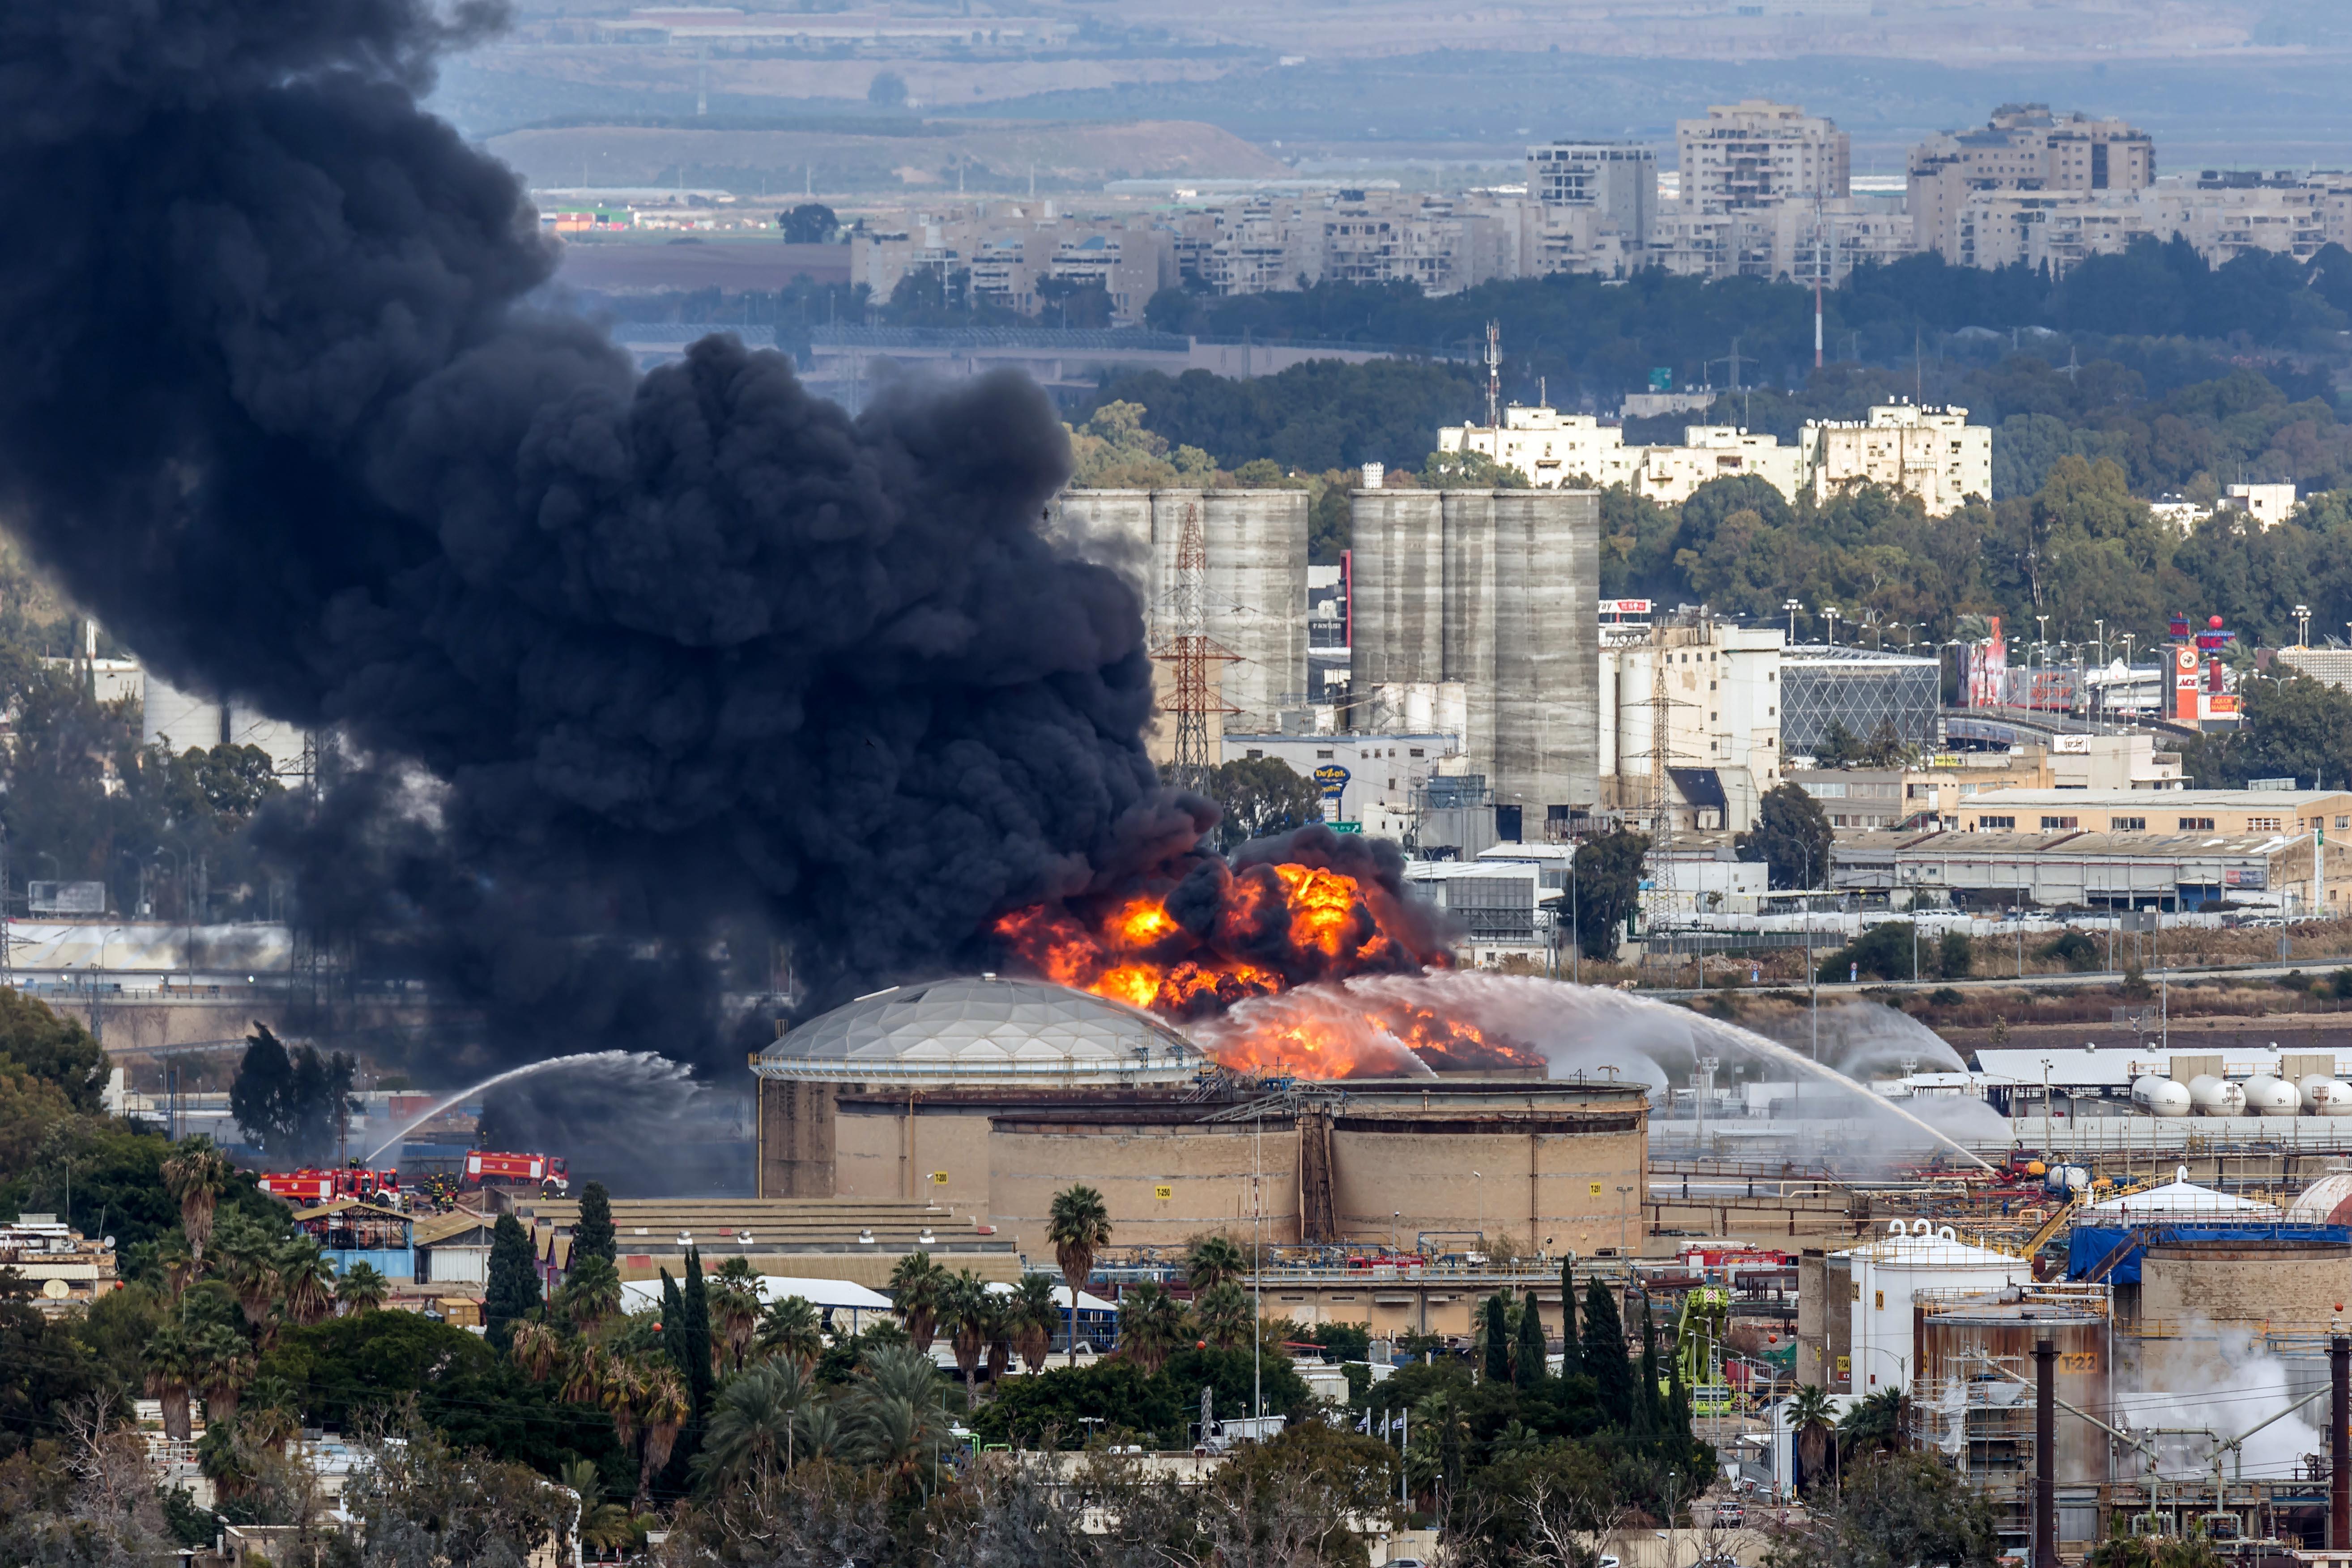 İsrail'in petrol rafinerisinde yangın